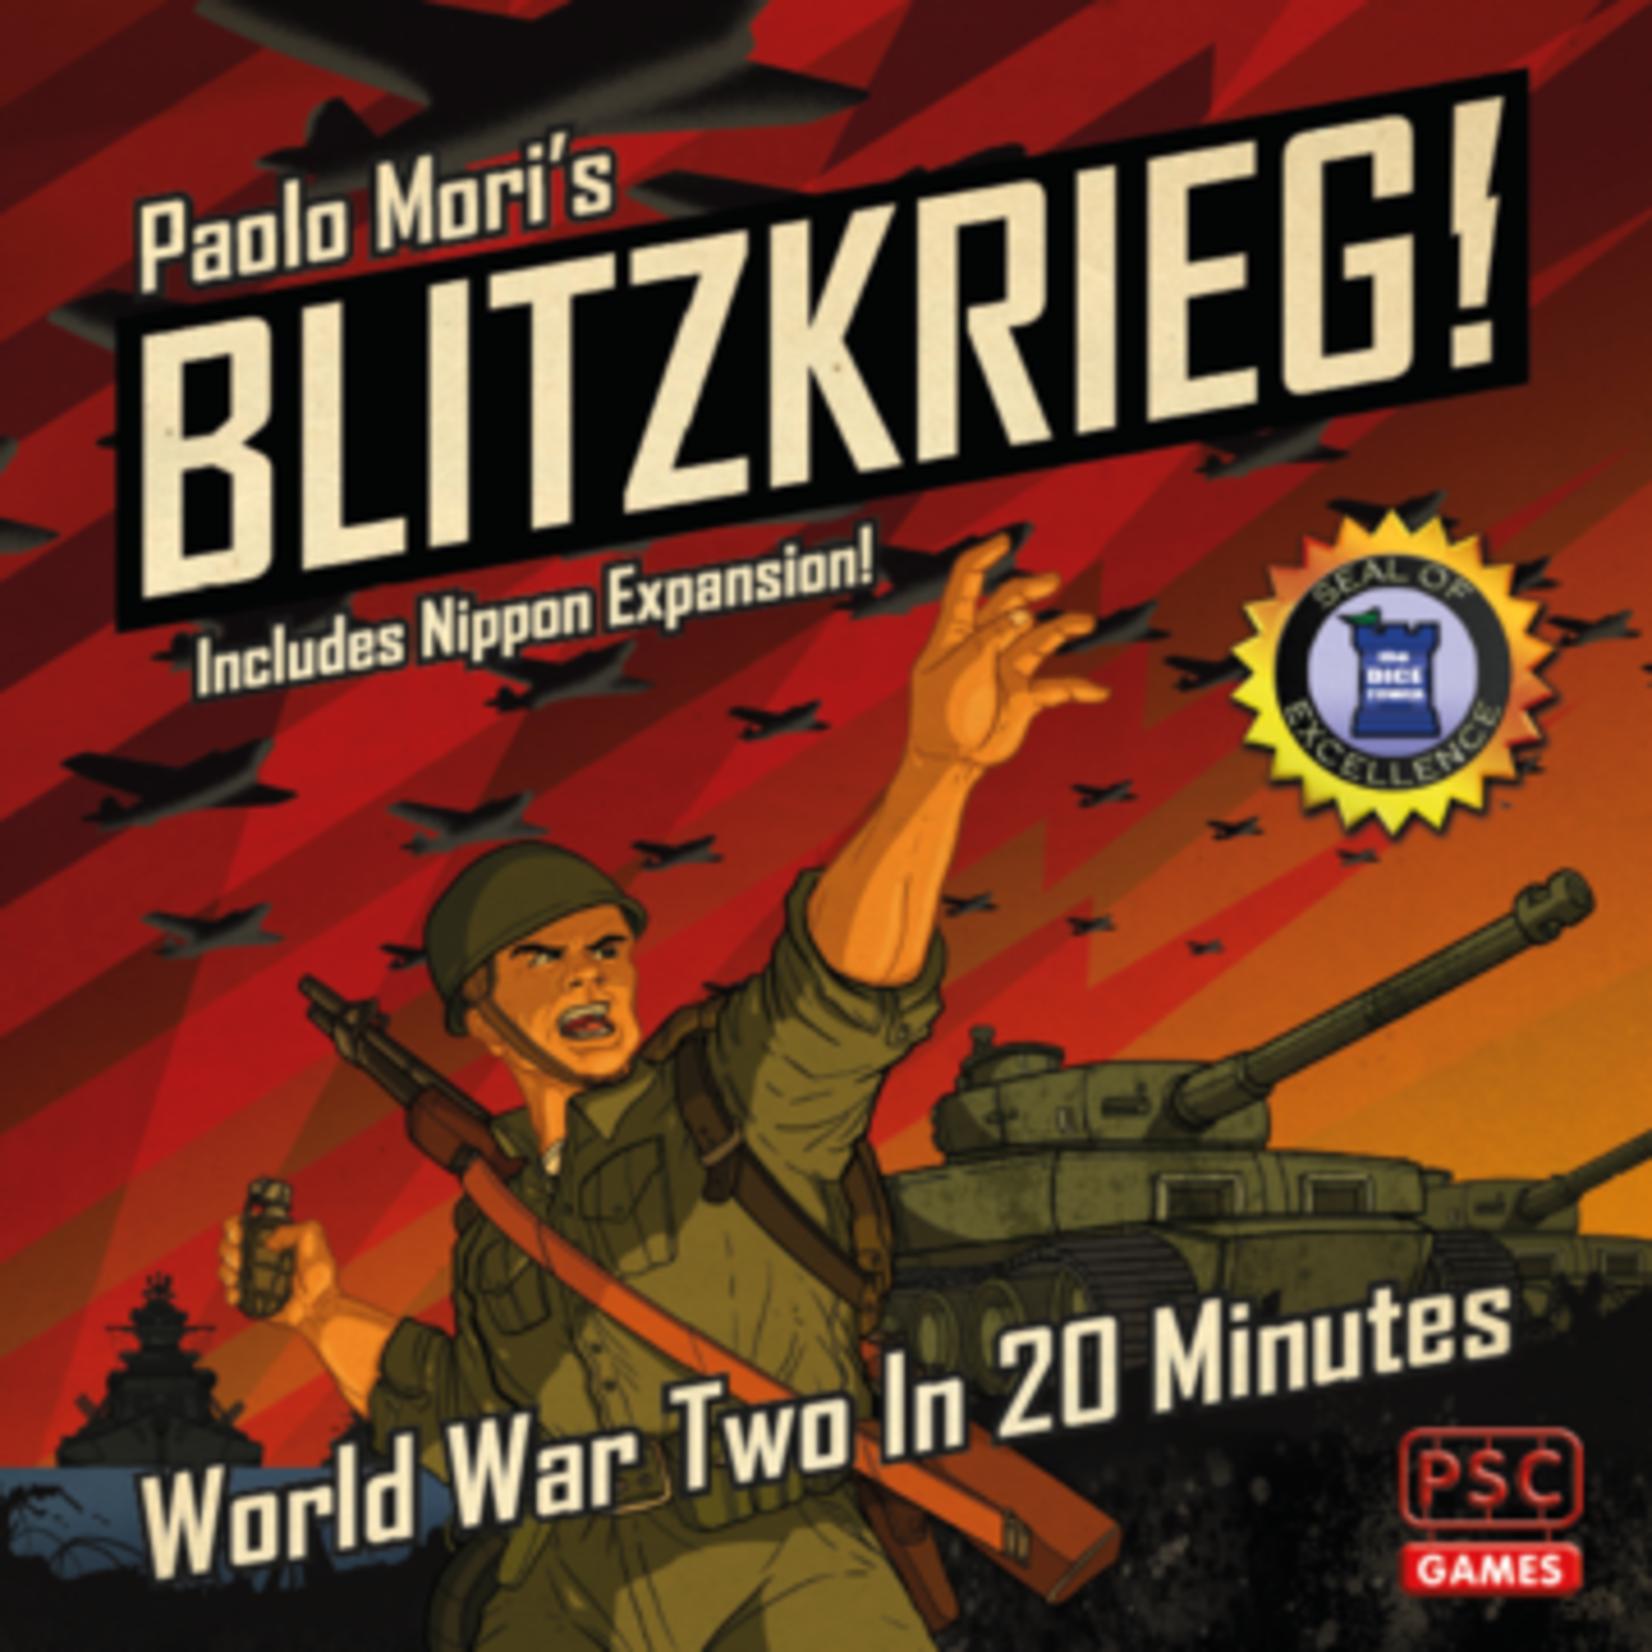 Plastic Soldier Company Blitzkrieg! Complete Edition